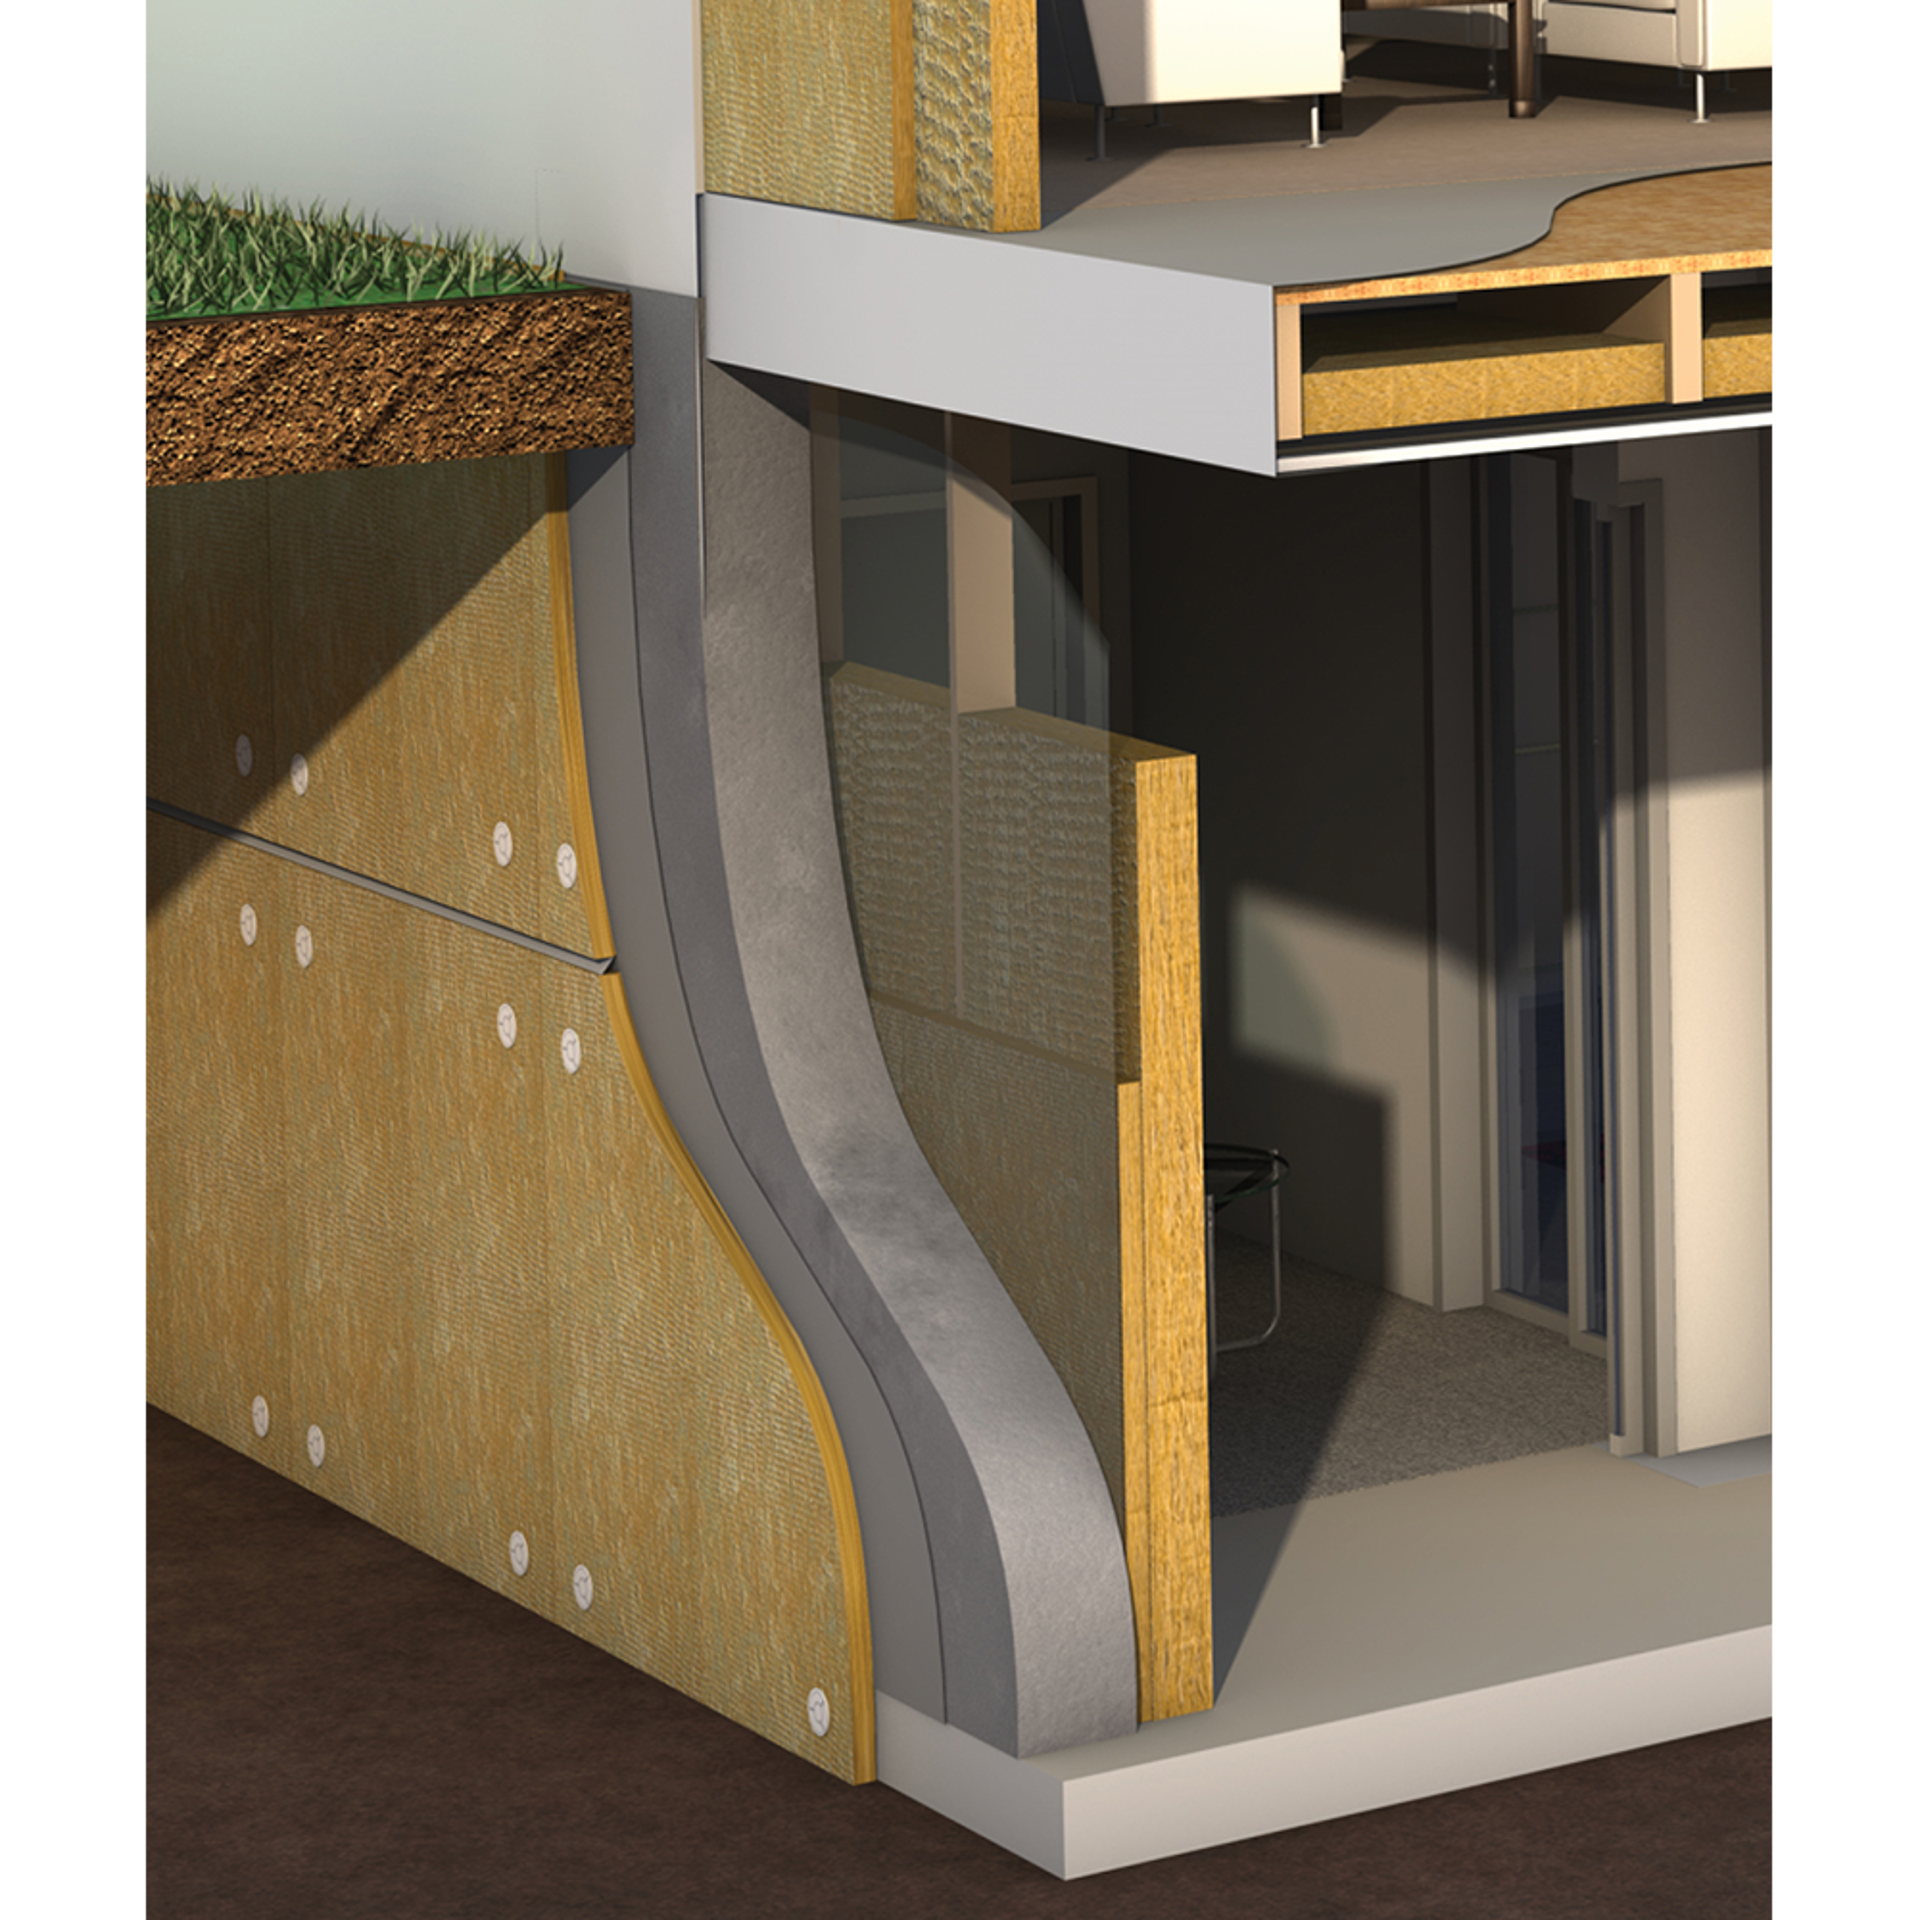 Exterior Insulated Below Grade Insulation